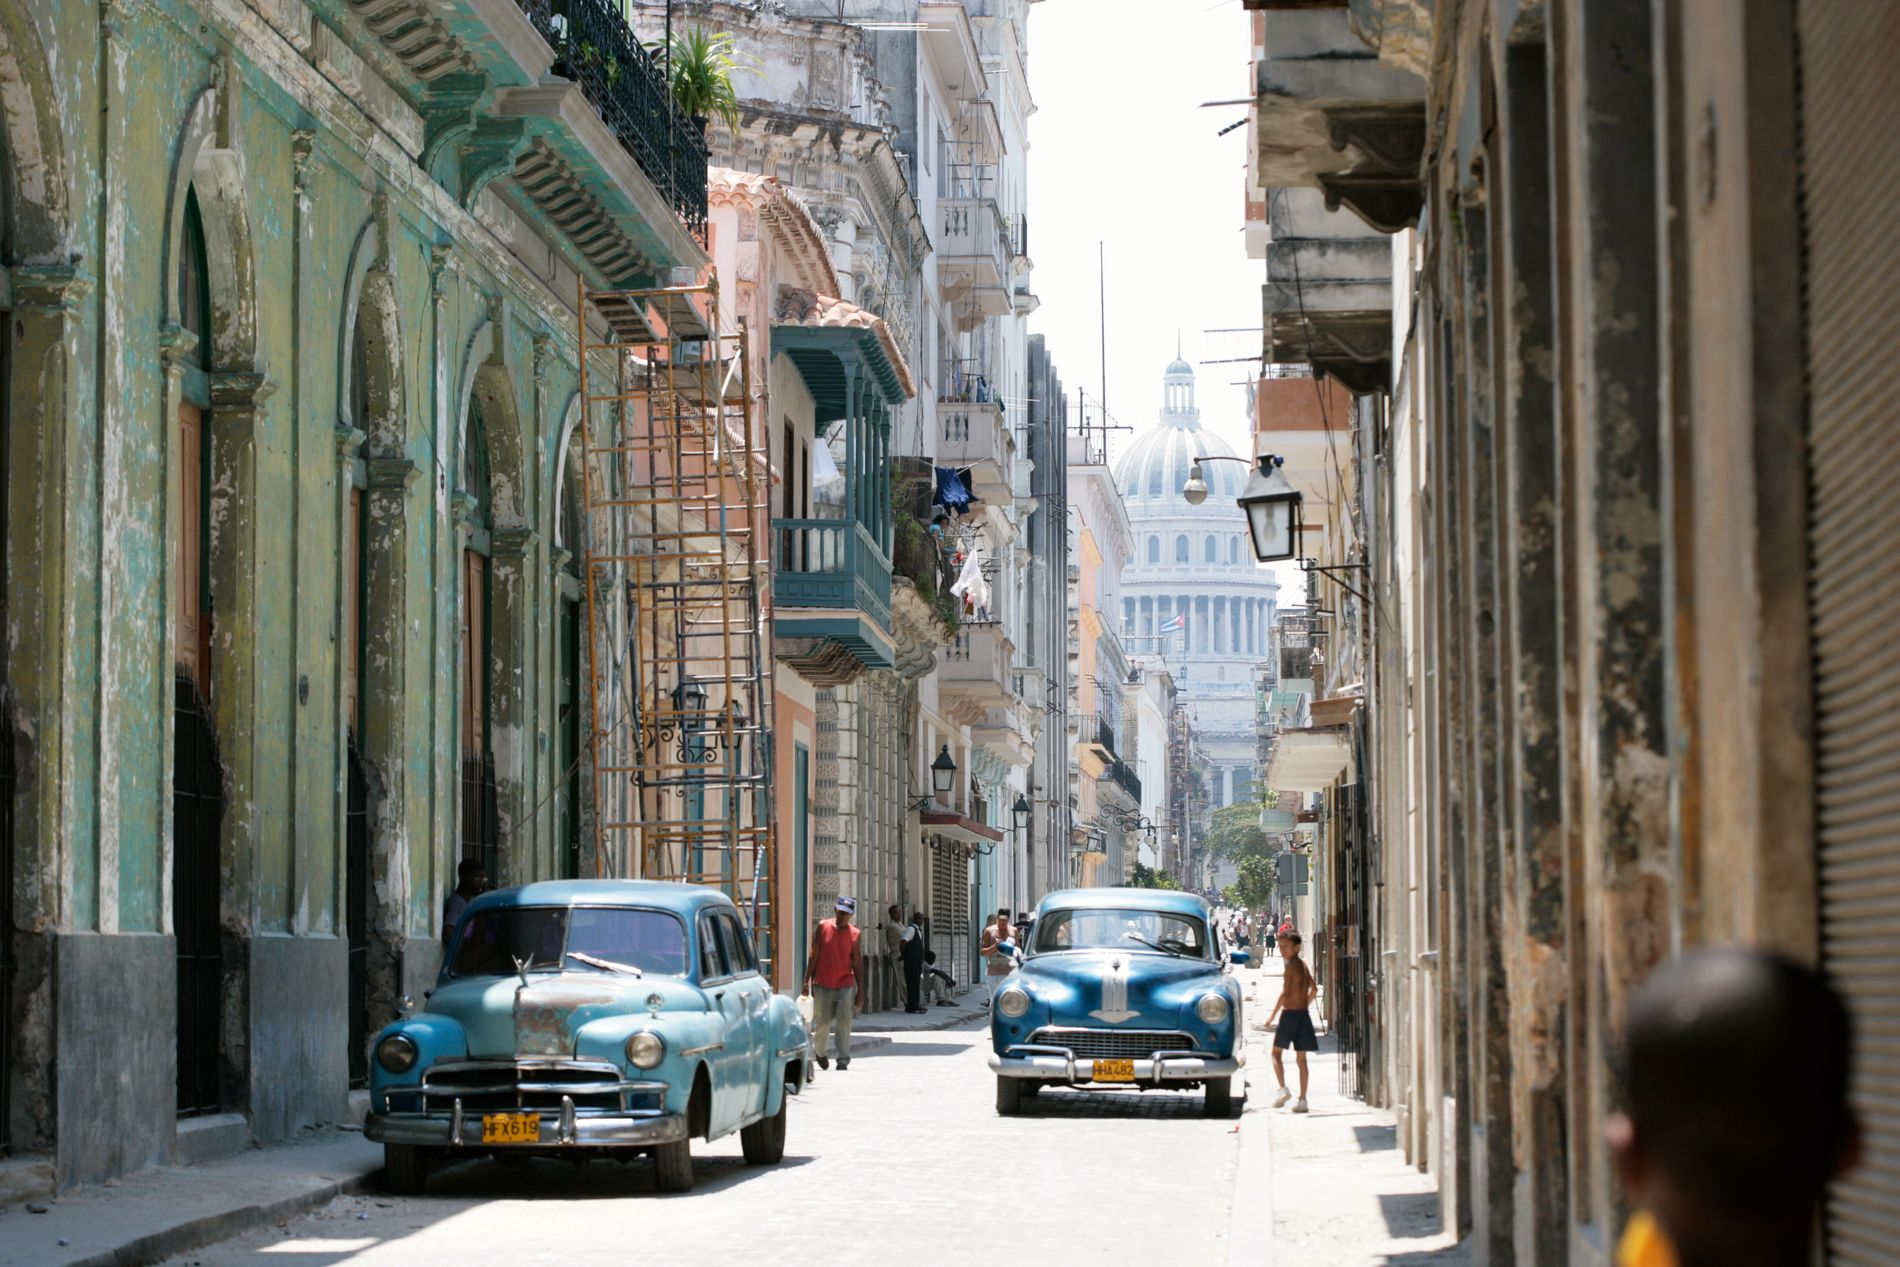 VALG: På Cuba er det ventet at man for første gang på 59 år vil få en president som ikke tilhører Castro-familien.